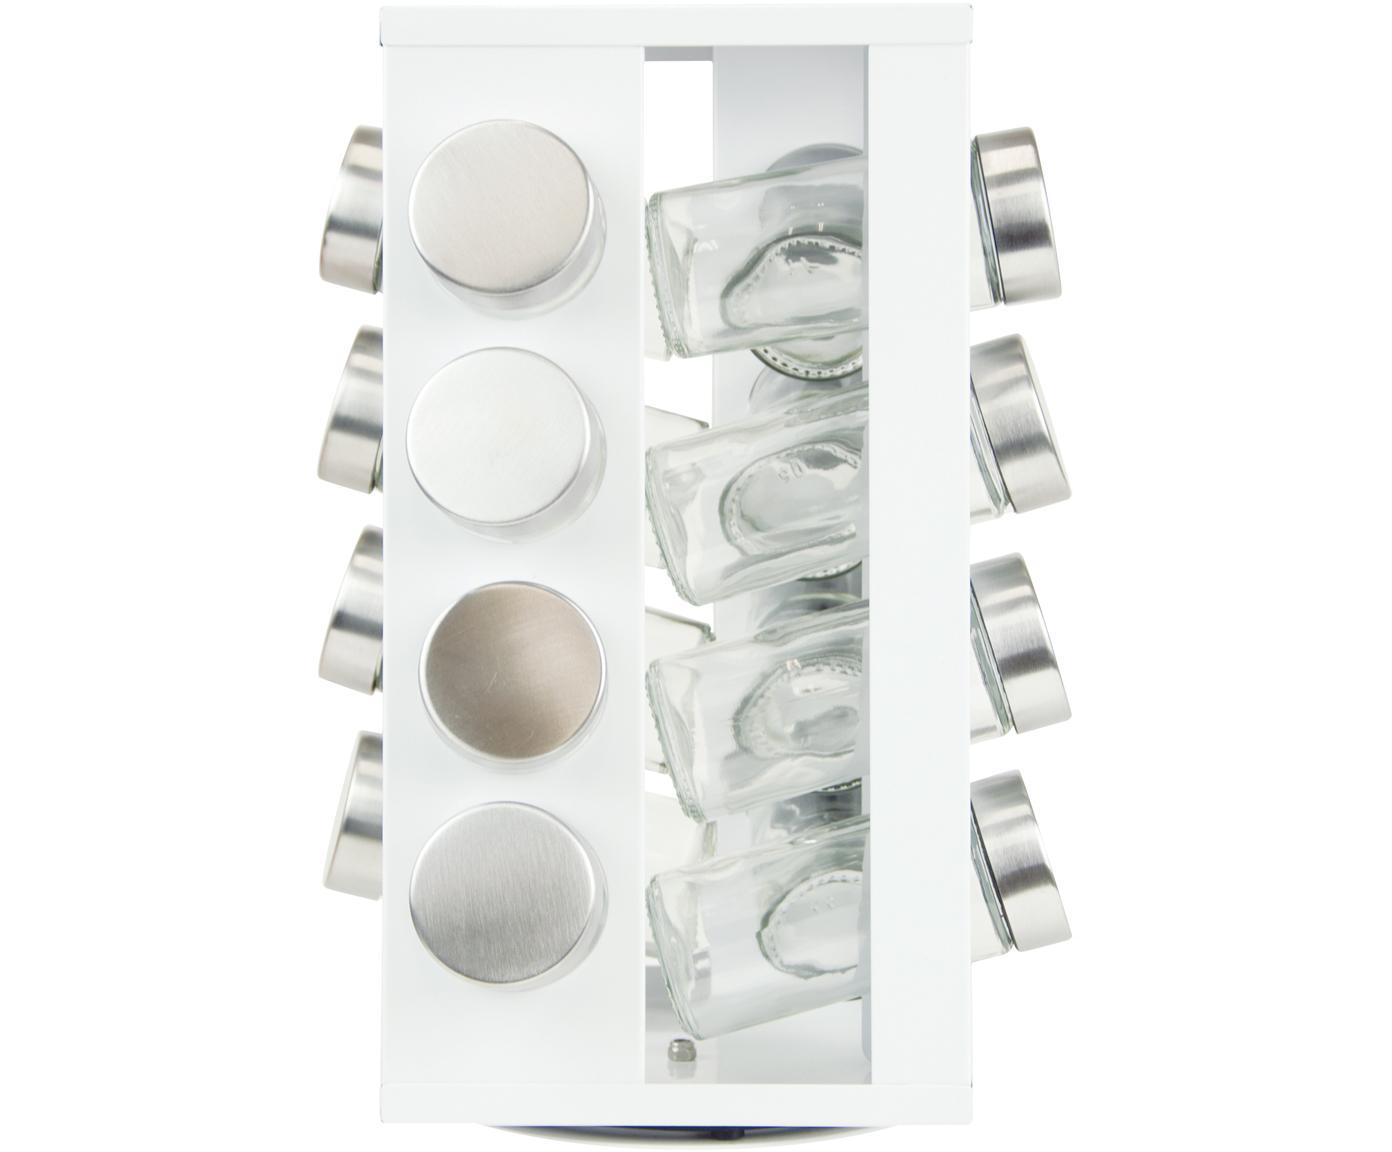 Kruidenrek Soho, 17-delig, Glas, metaal, kunststof, edelstaal, Wit, transparant, zilverkleurig, 18 x 29 cm